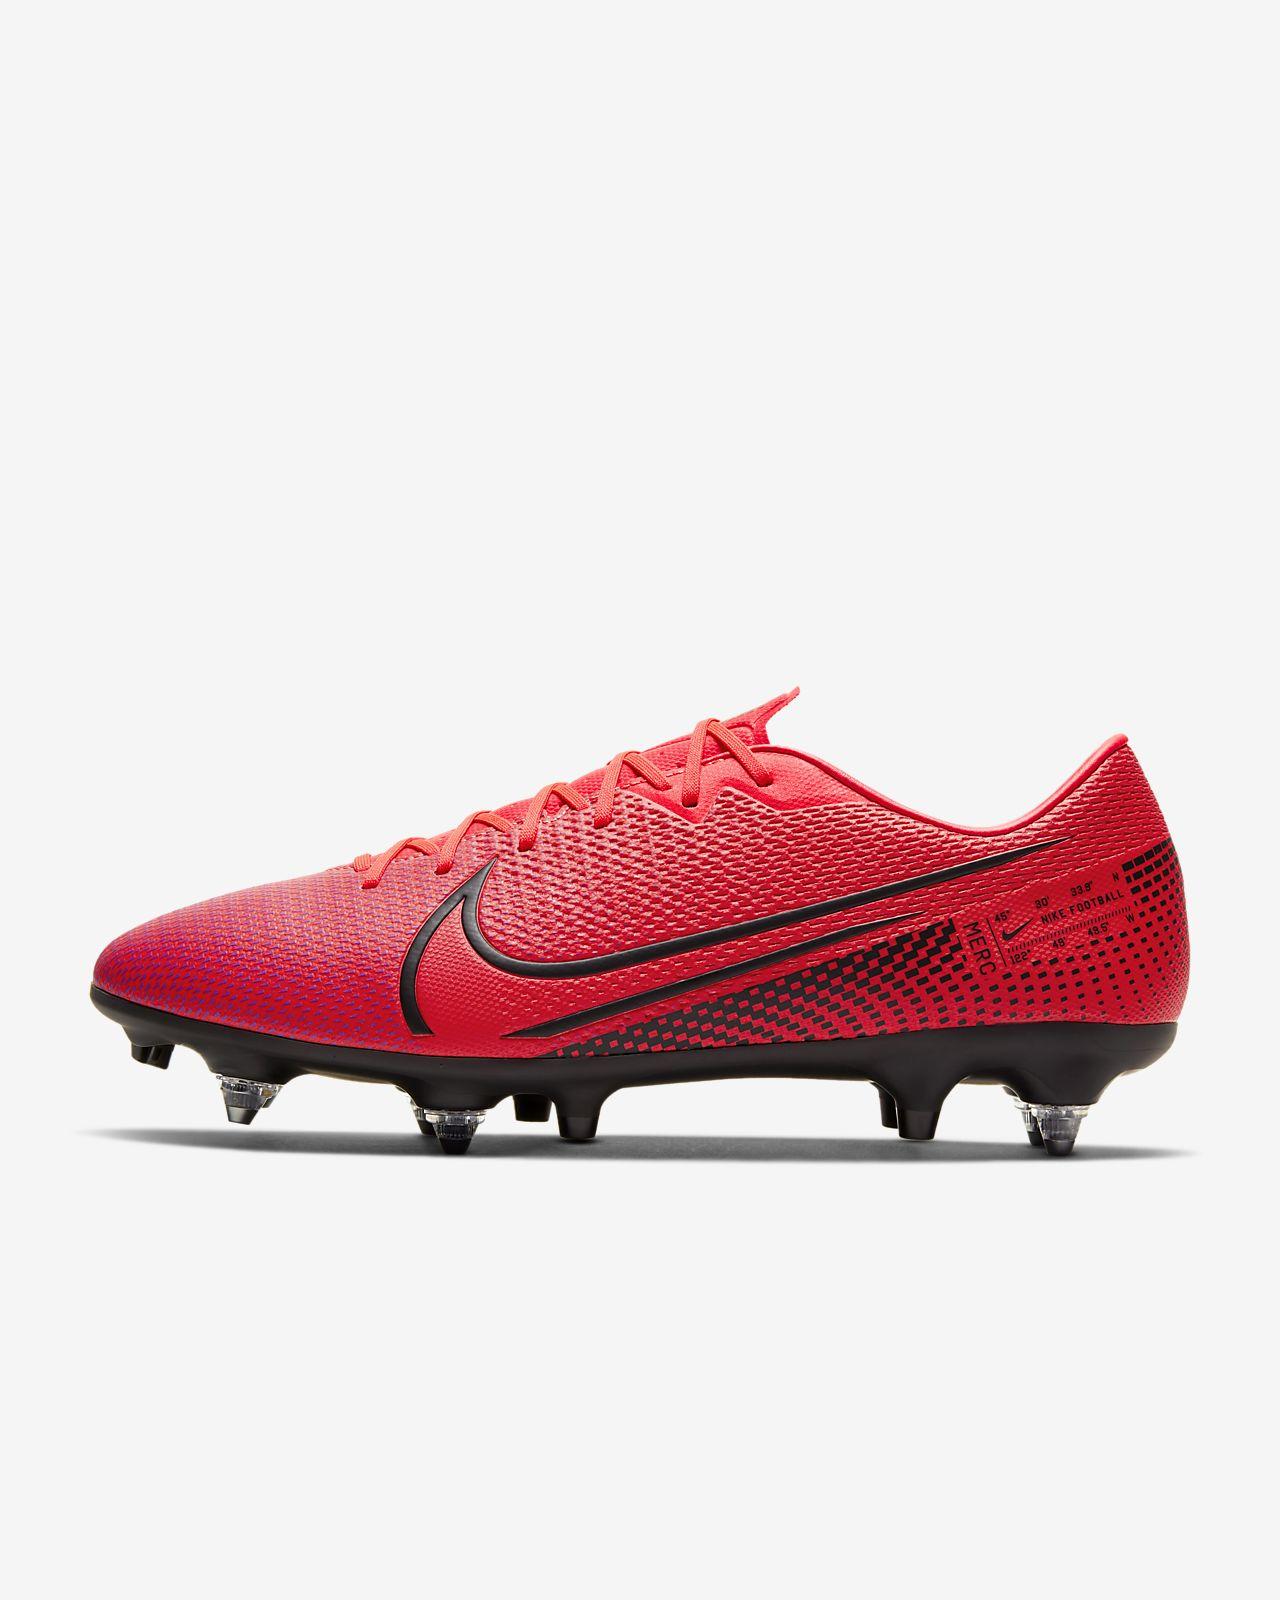 Scarpa da calcio per terreni morbidi Nike Mercurial Vapor 13 Academy SG PRO Anti Clog Traction